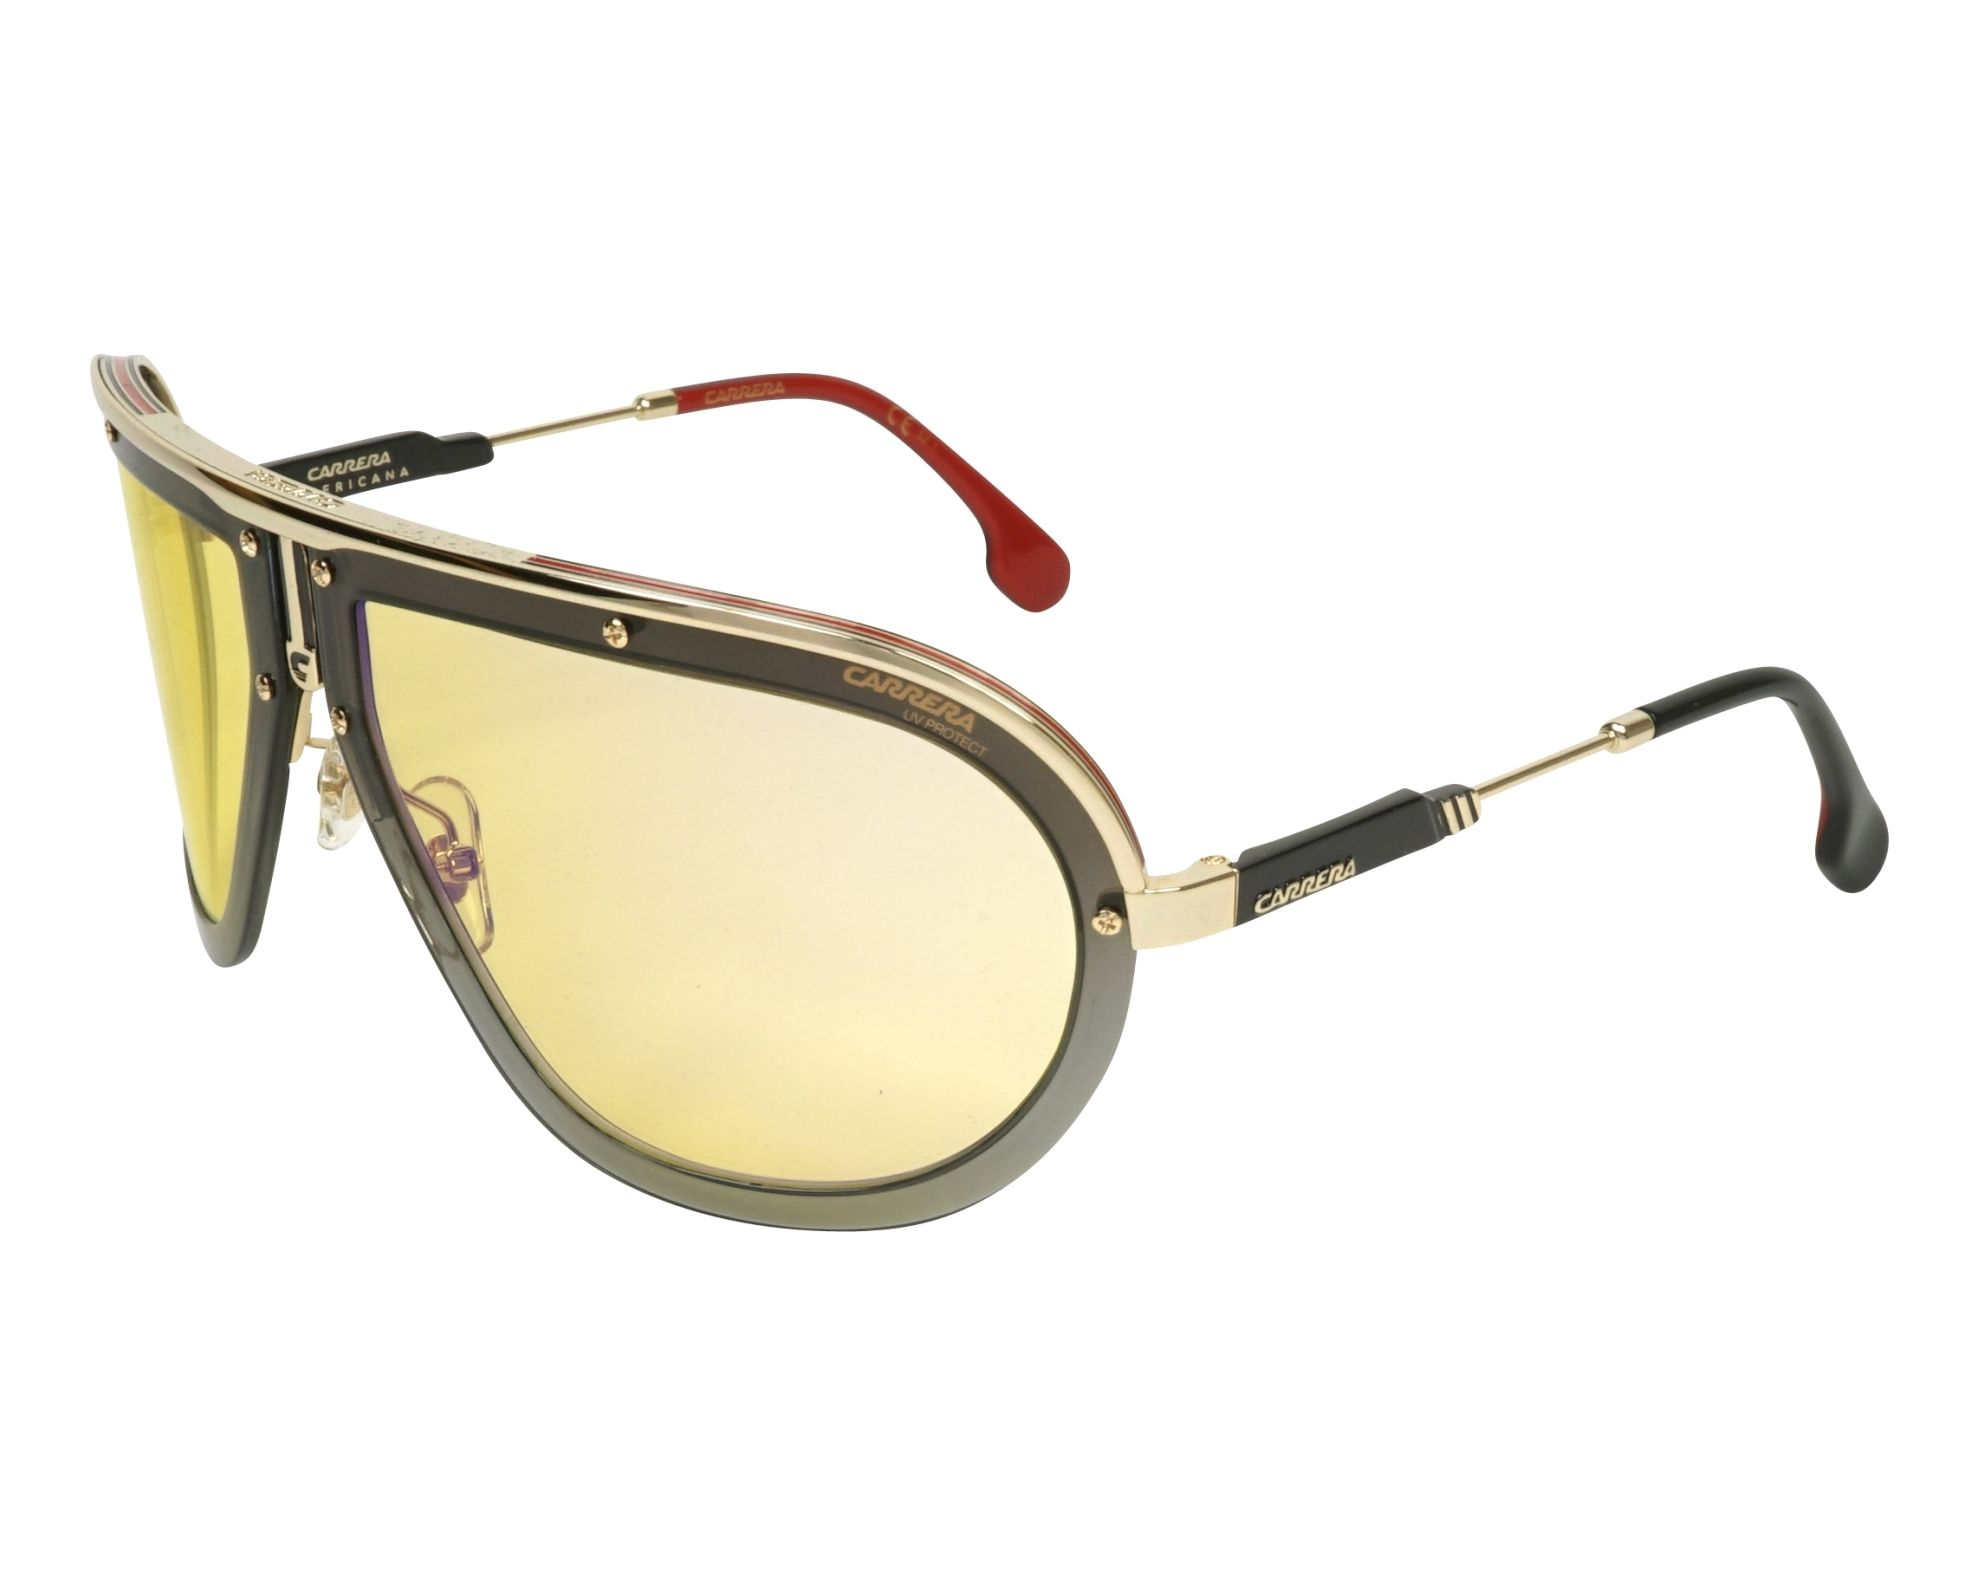 bc42bac701 Sunglasses Carrera AMERICANA DYG CU 66-17 Gold Grey profile view